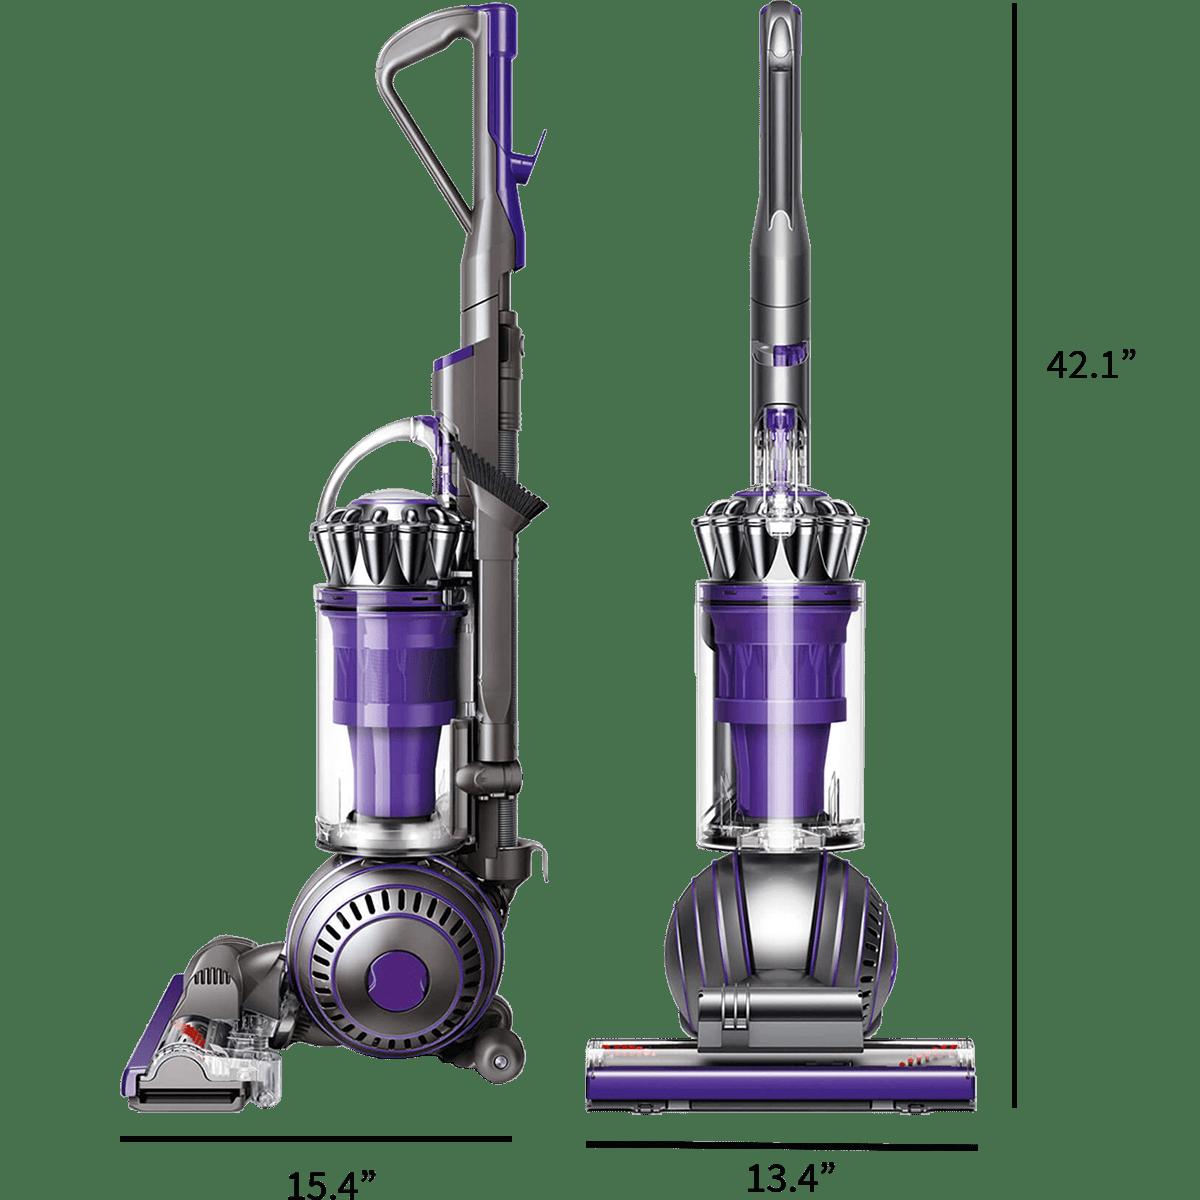 Dyson Ball Animal 2 Upright Vacuum Cleaner Sylvane